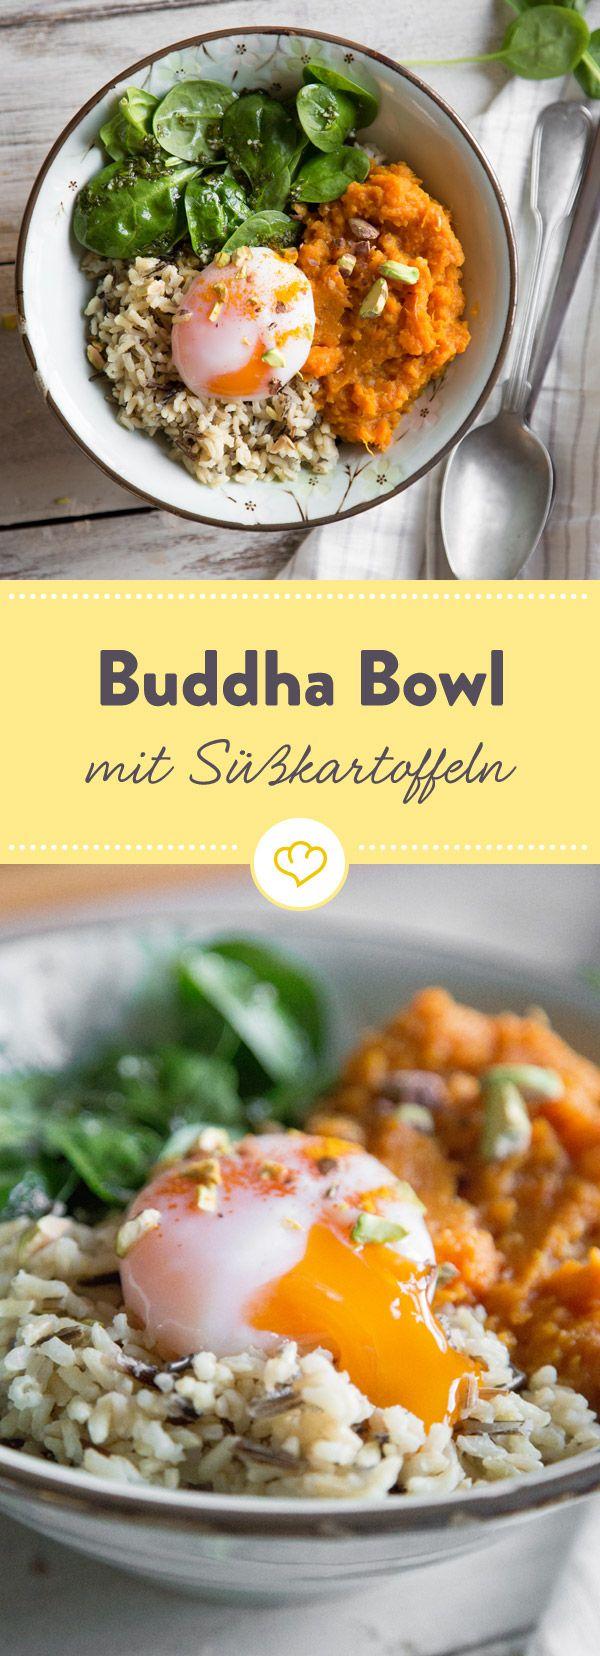 Photo of Buddha bowl with turmeric sweet potatoes